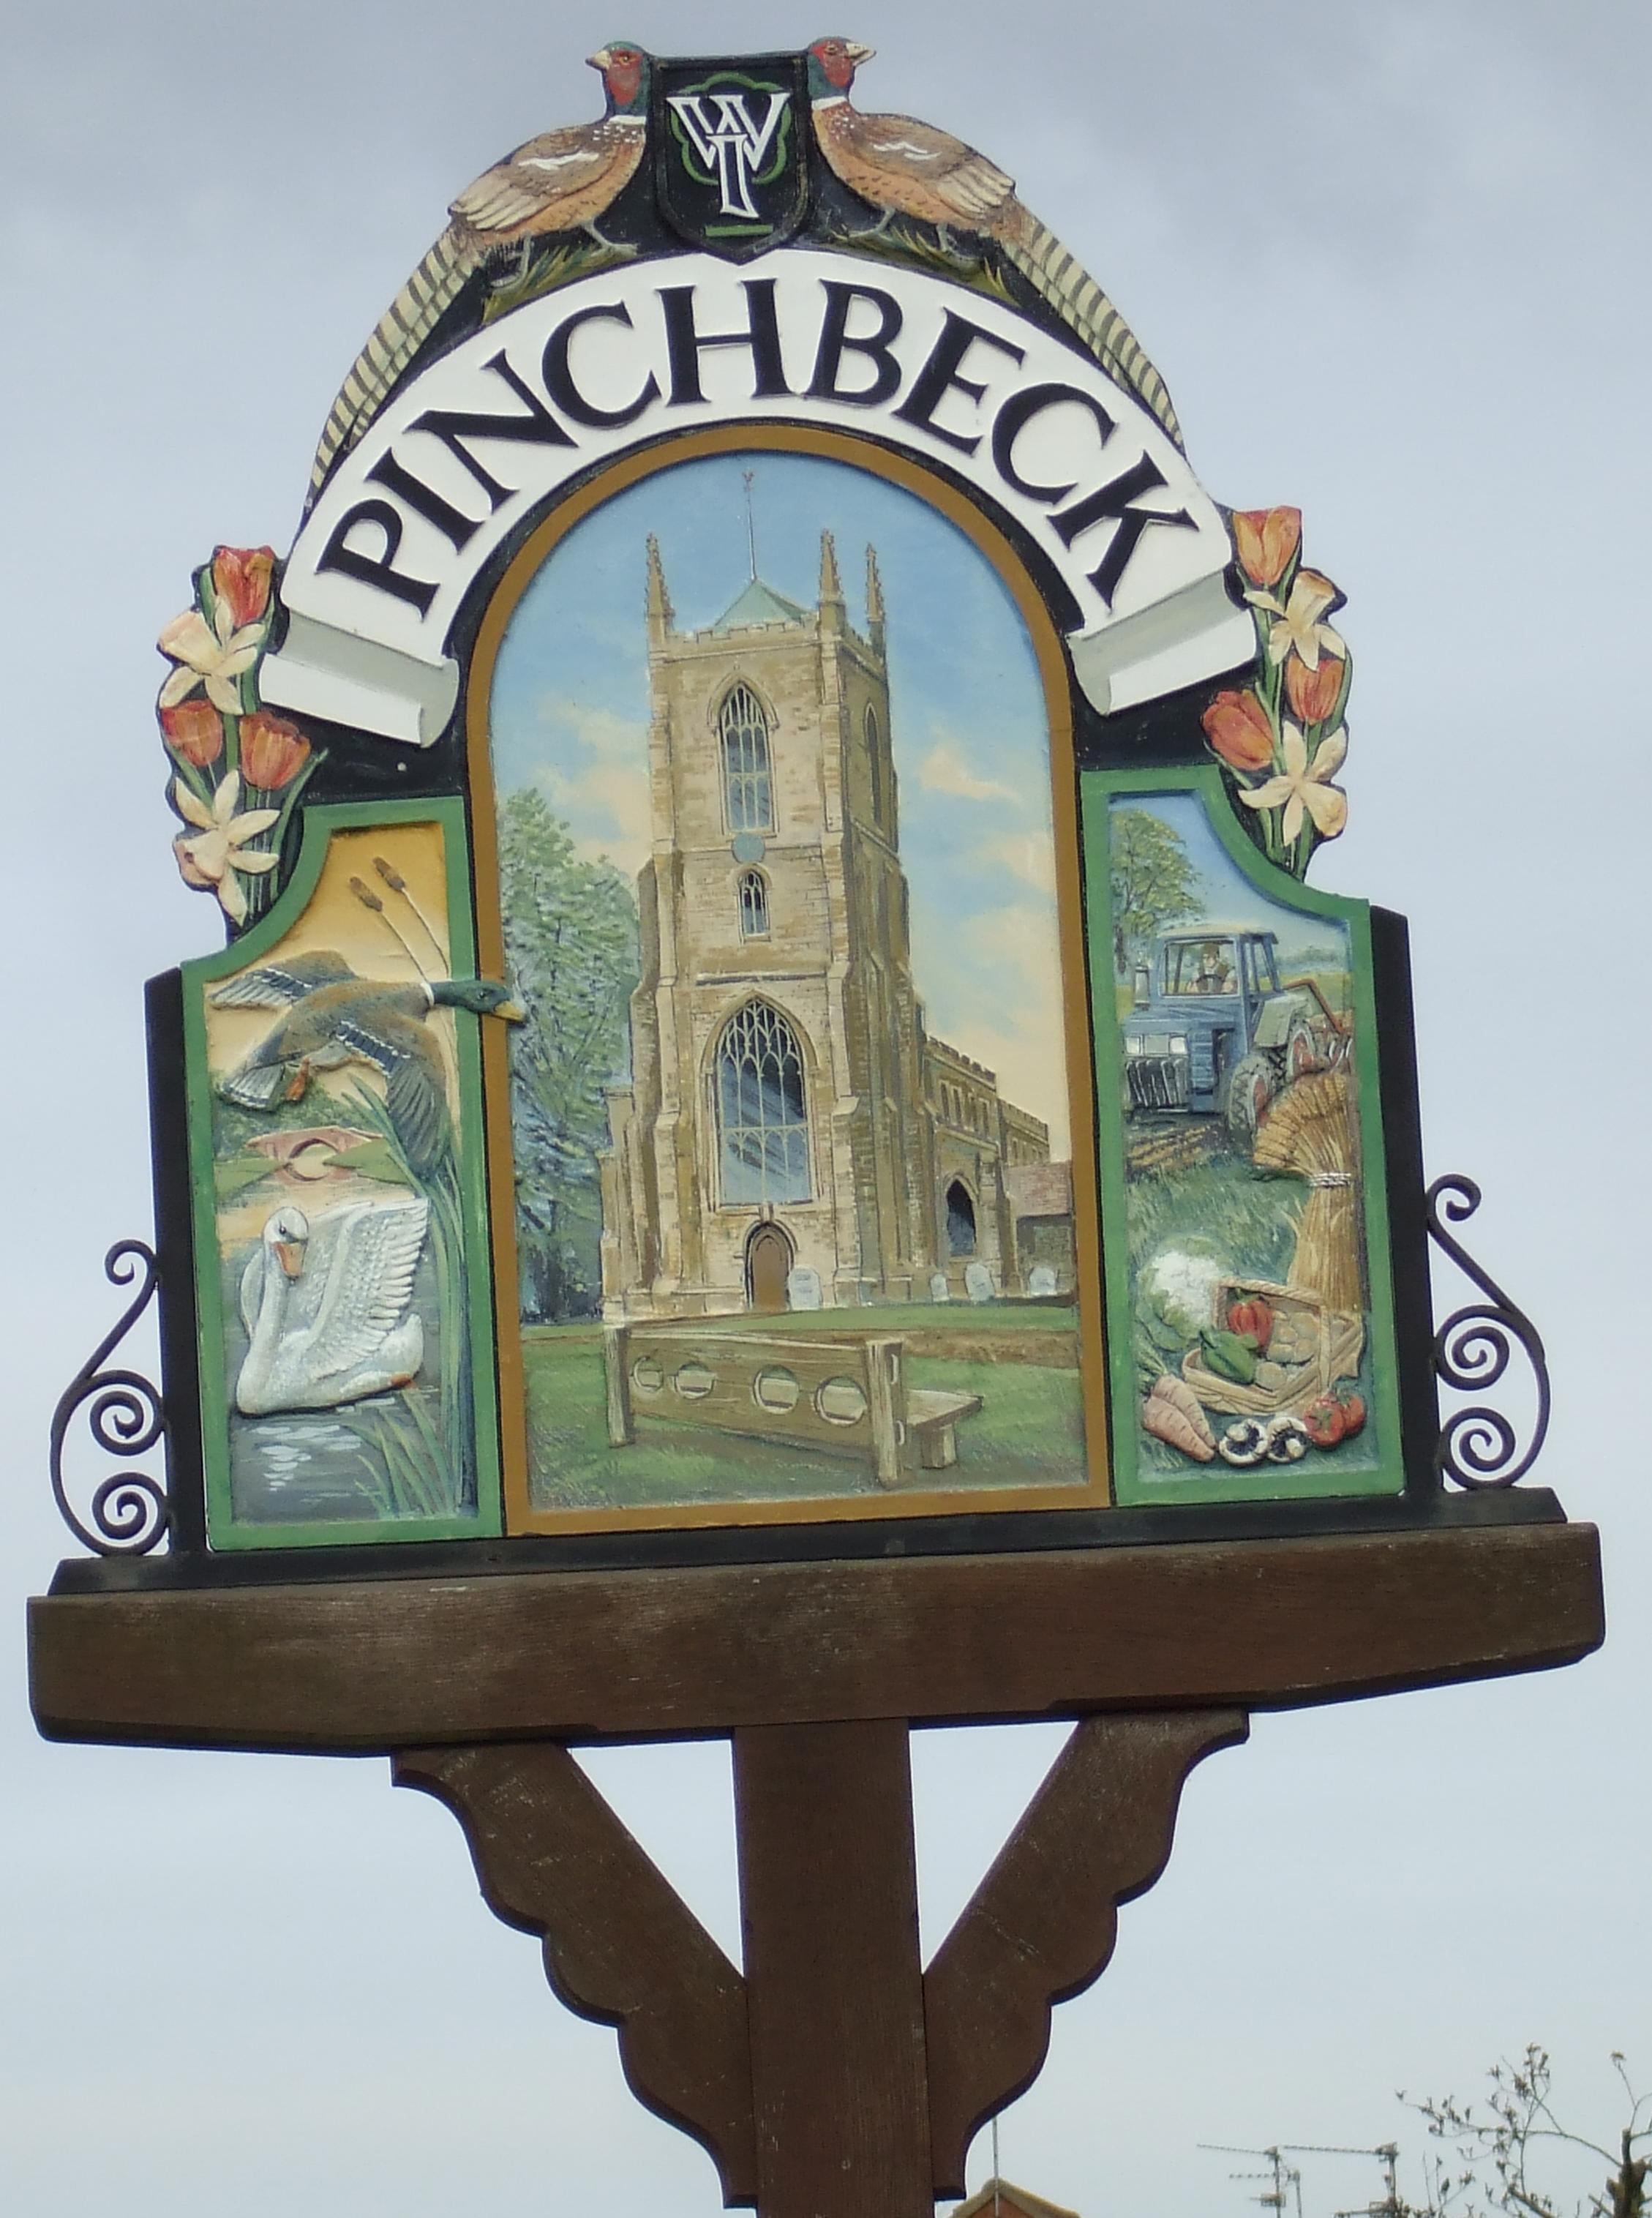 Pinchbeck sign 3